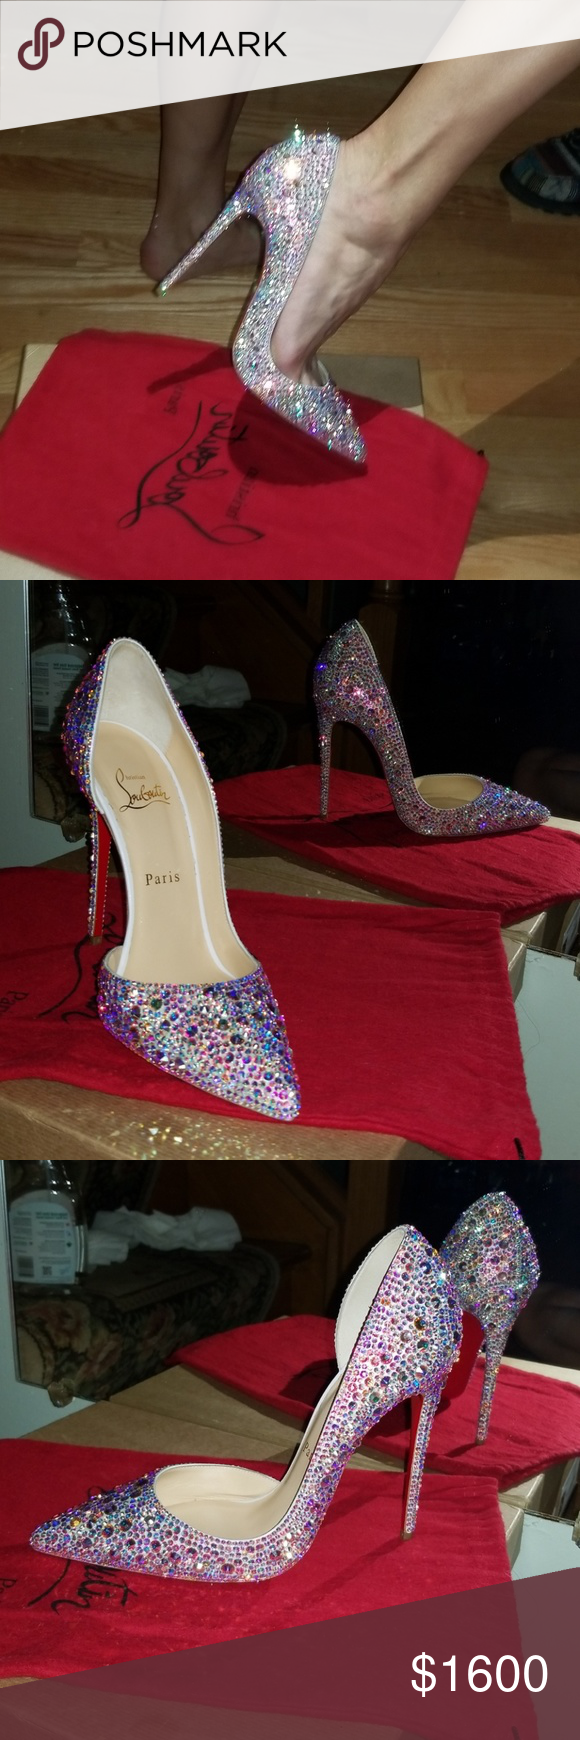 premium selection 3005a 4a3d0 Christian louboutin iriza Swarovski strass heels Authentic ...